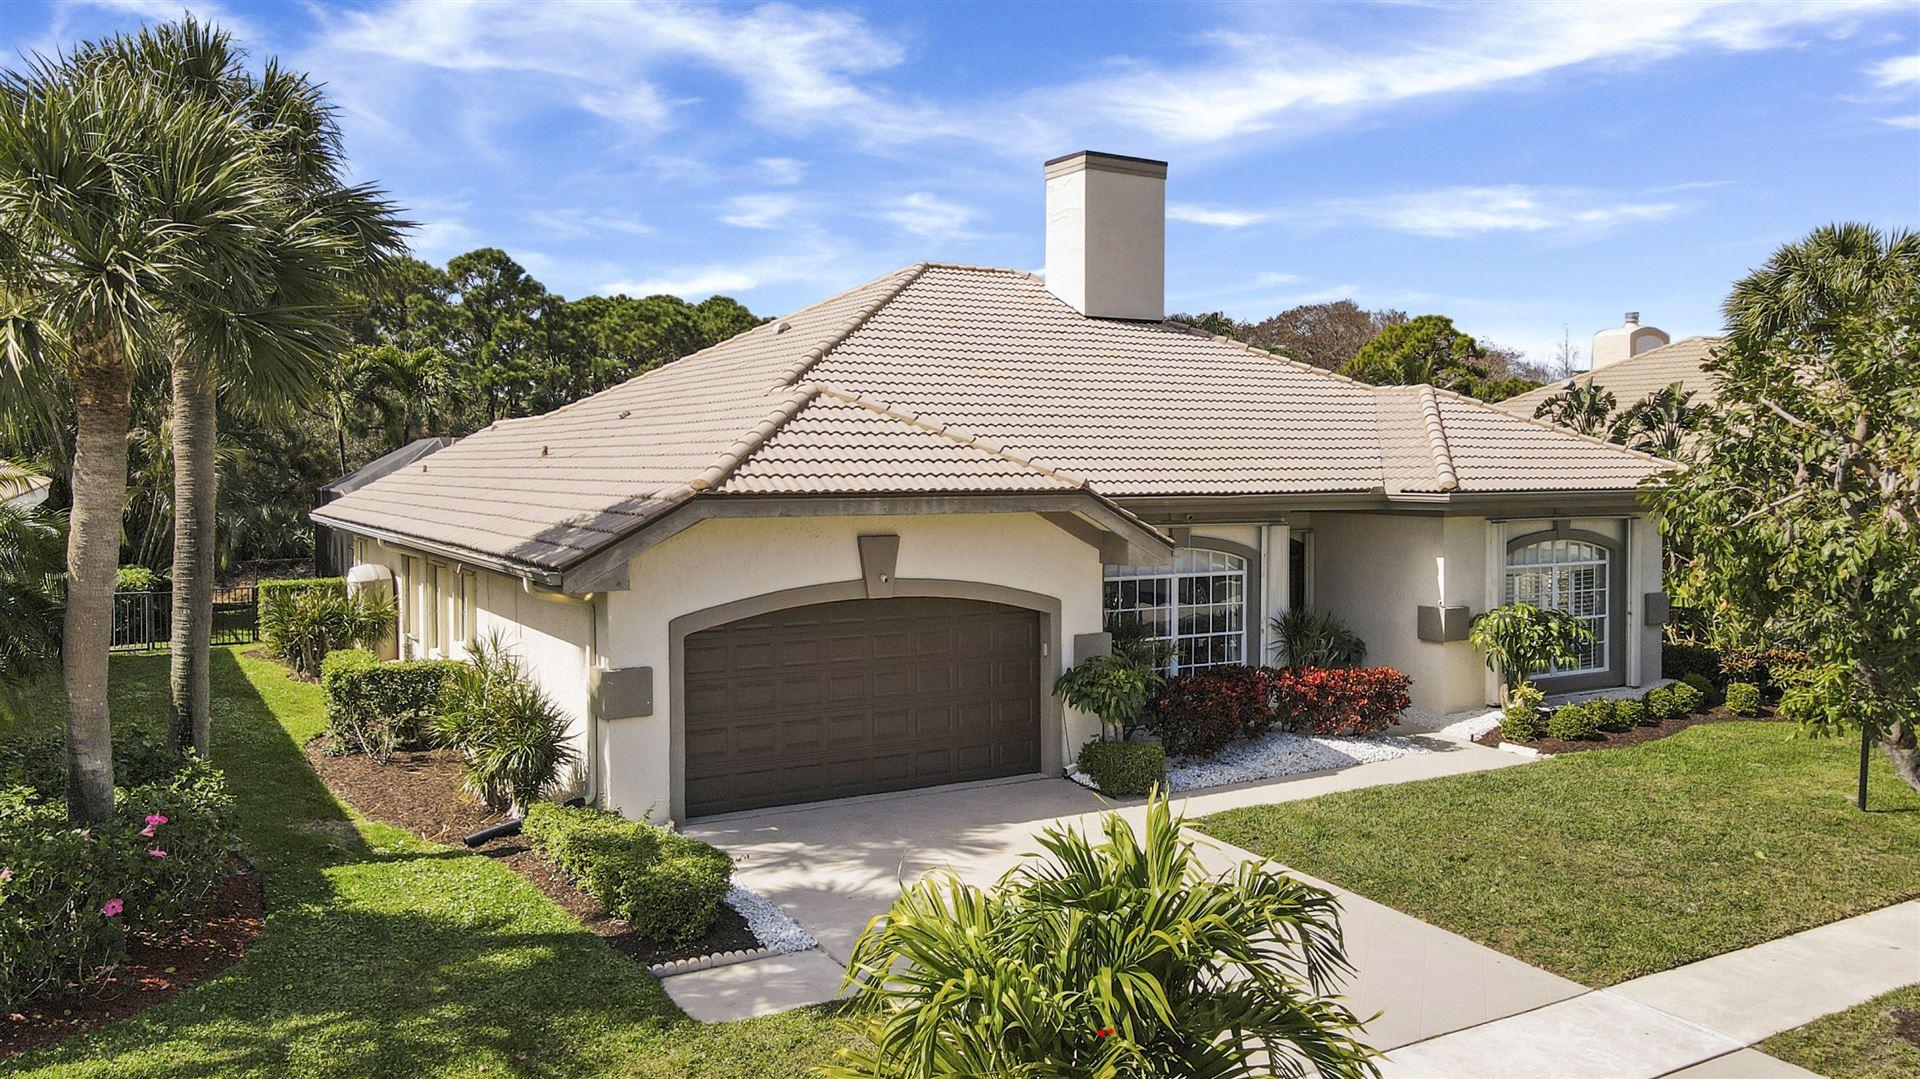 Photo of 13387 Miles Standish, Palm Beach Gardens, FL 33410 (MLS # RX-10692739)